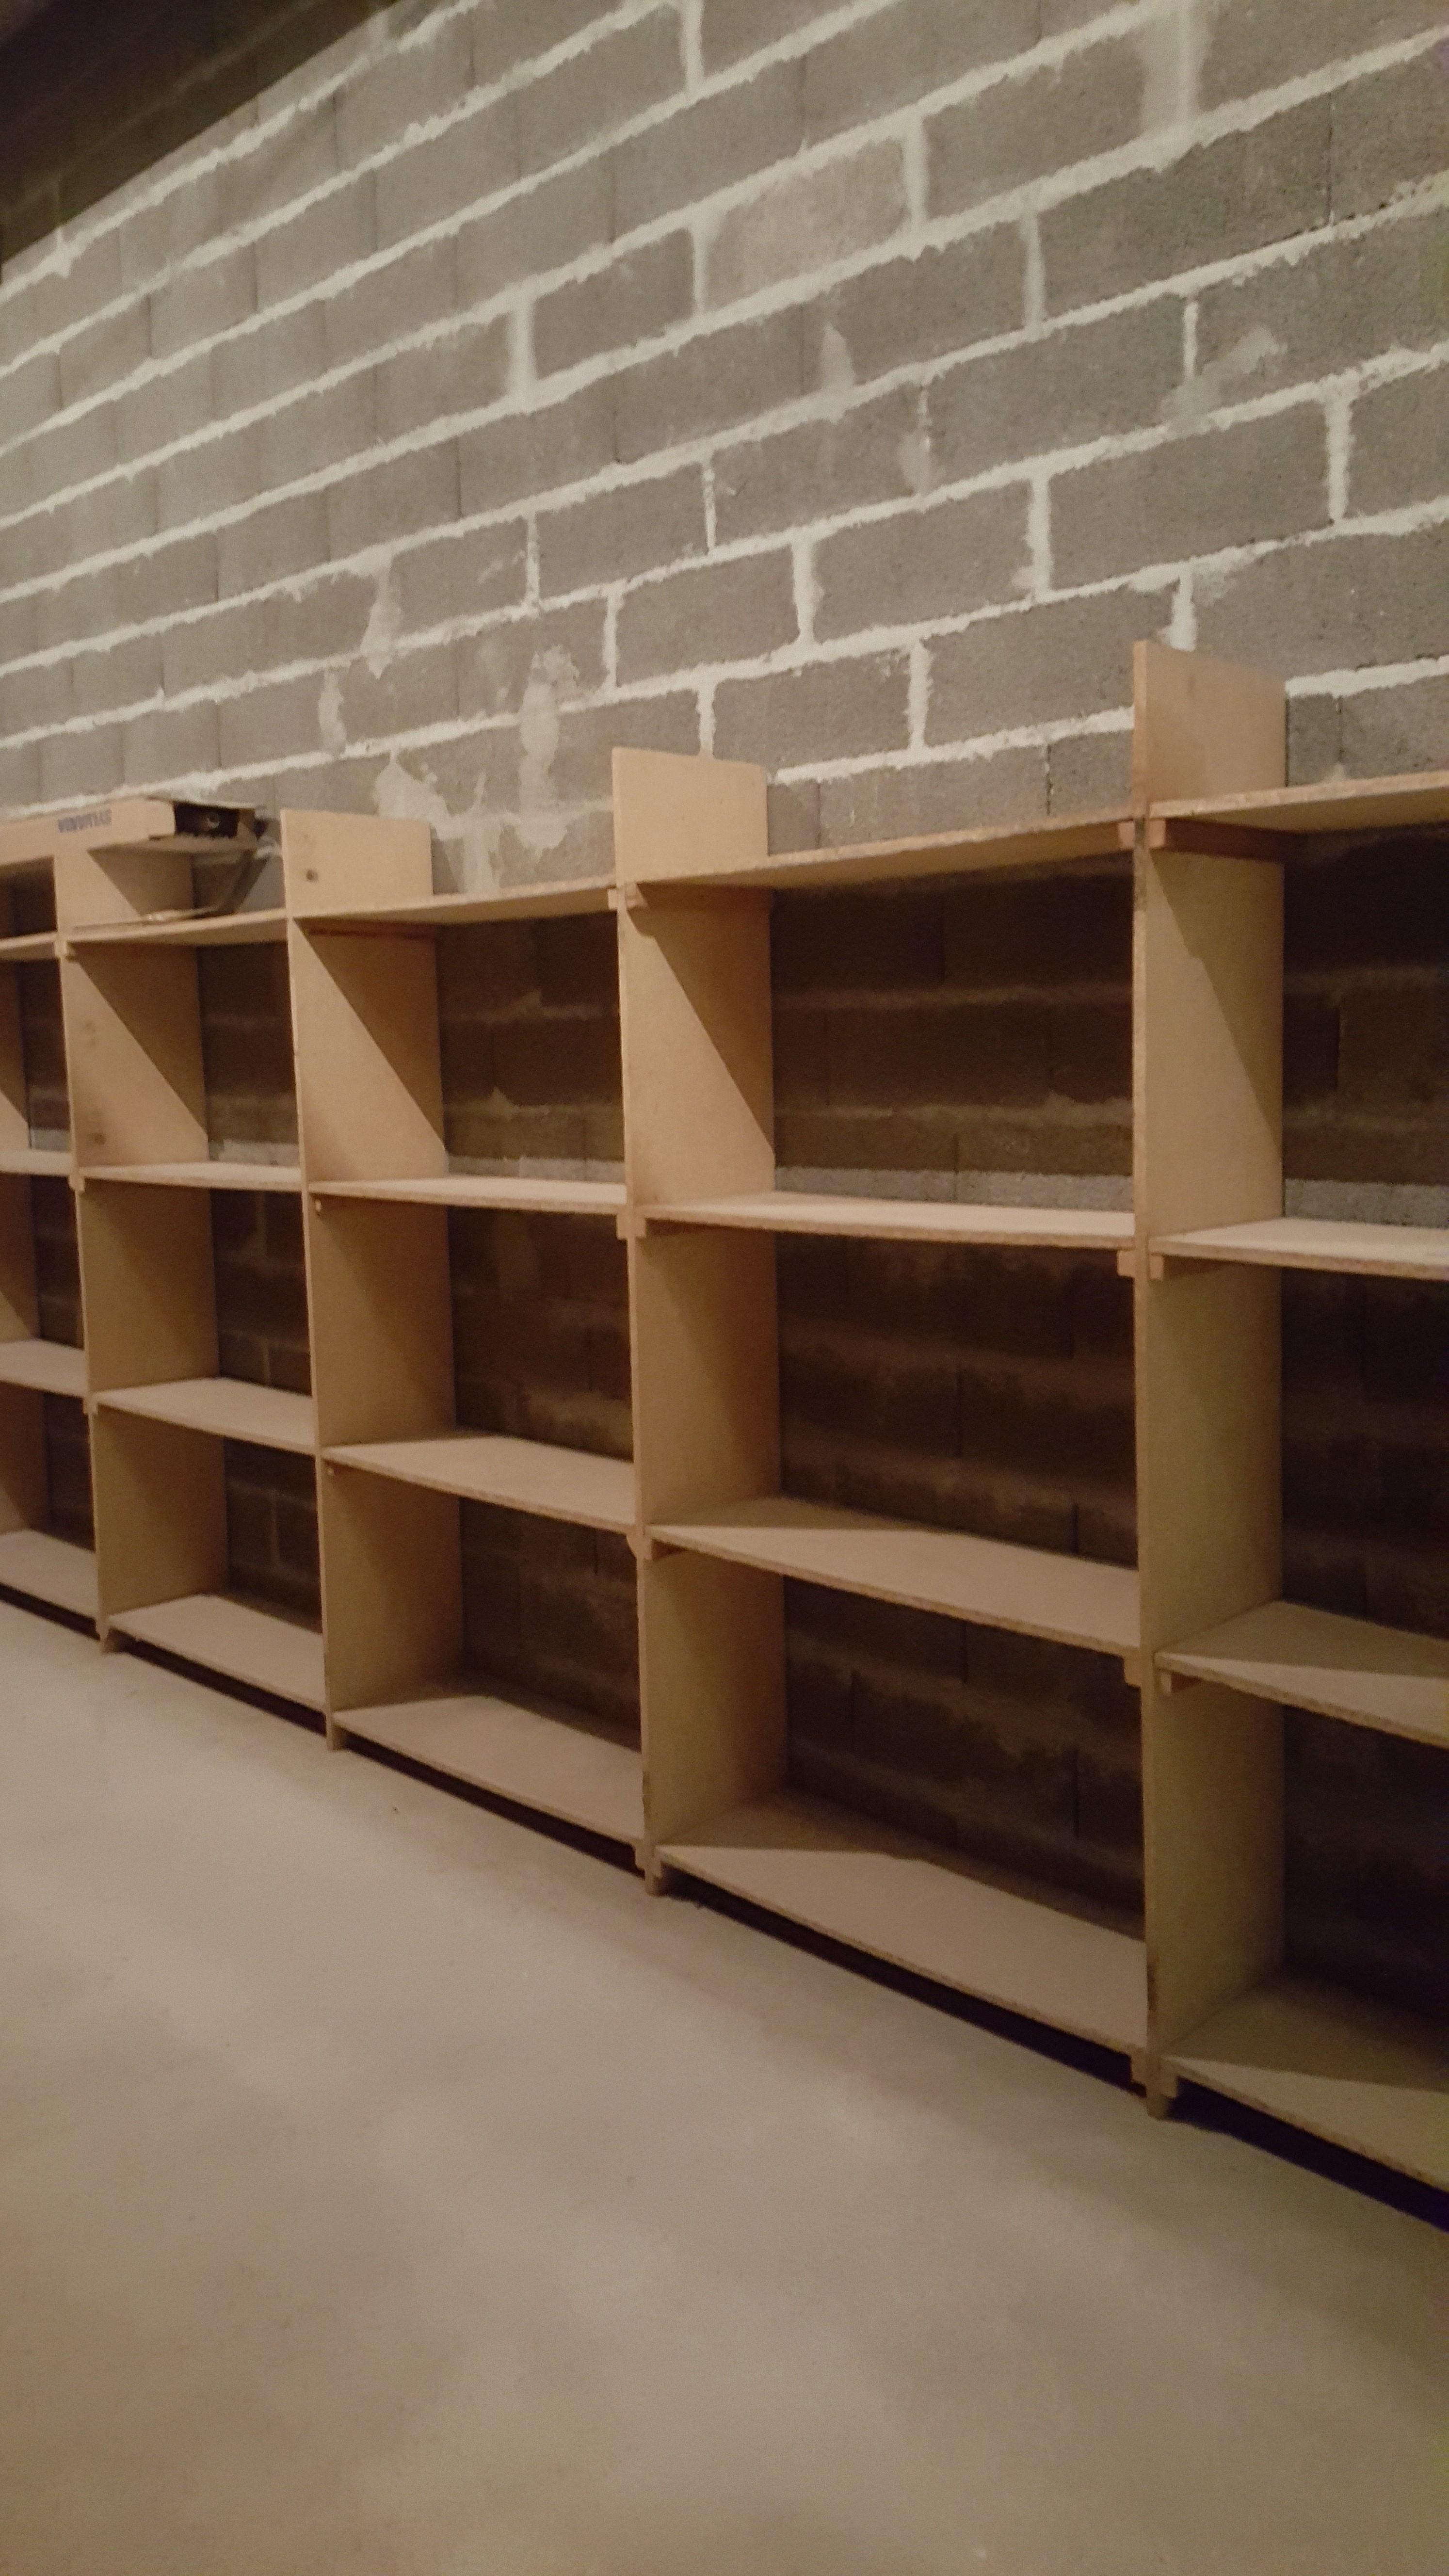 location 10m2 dans une r serve vand uvre l s nancy 54500. Black Bedroom Furniture Sets. Home Design Ideas